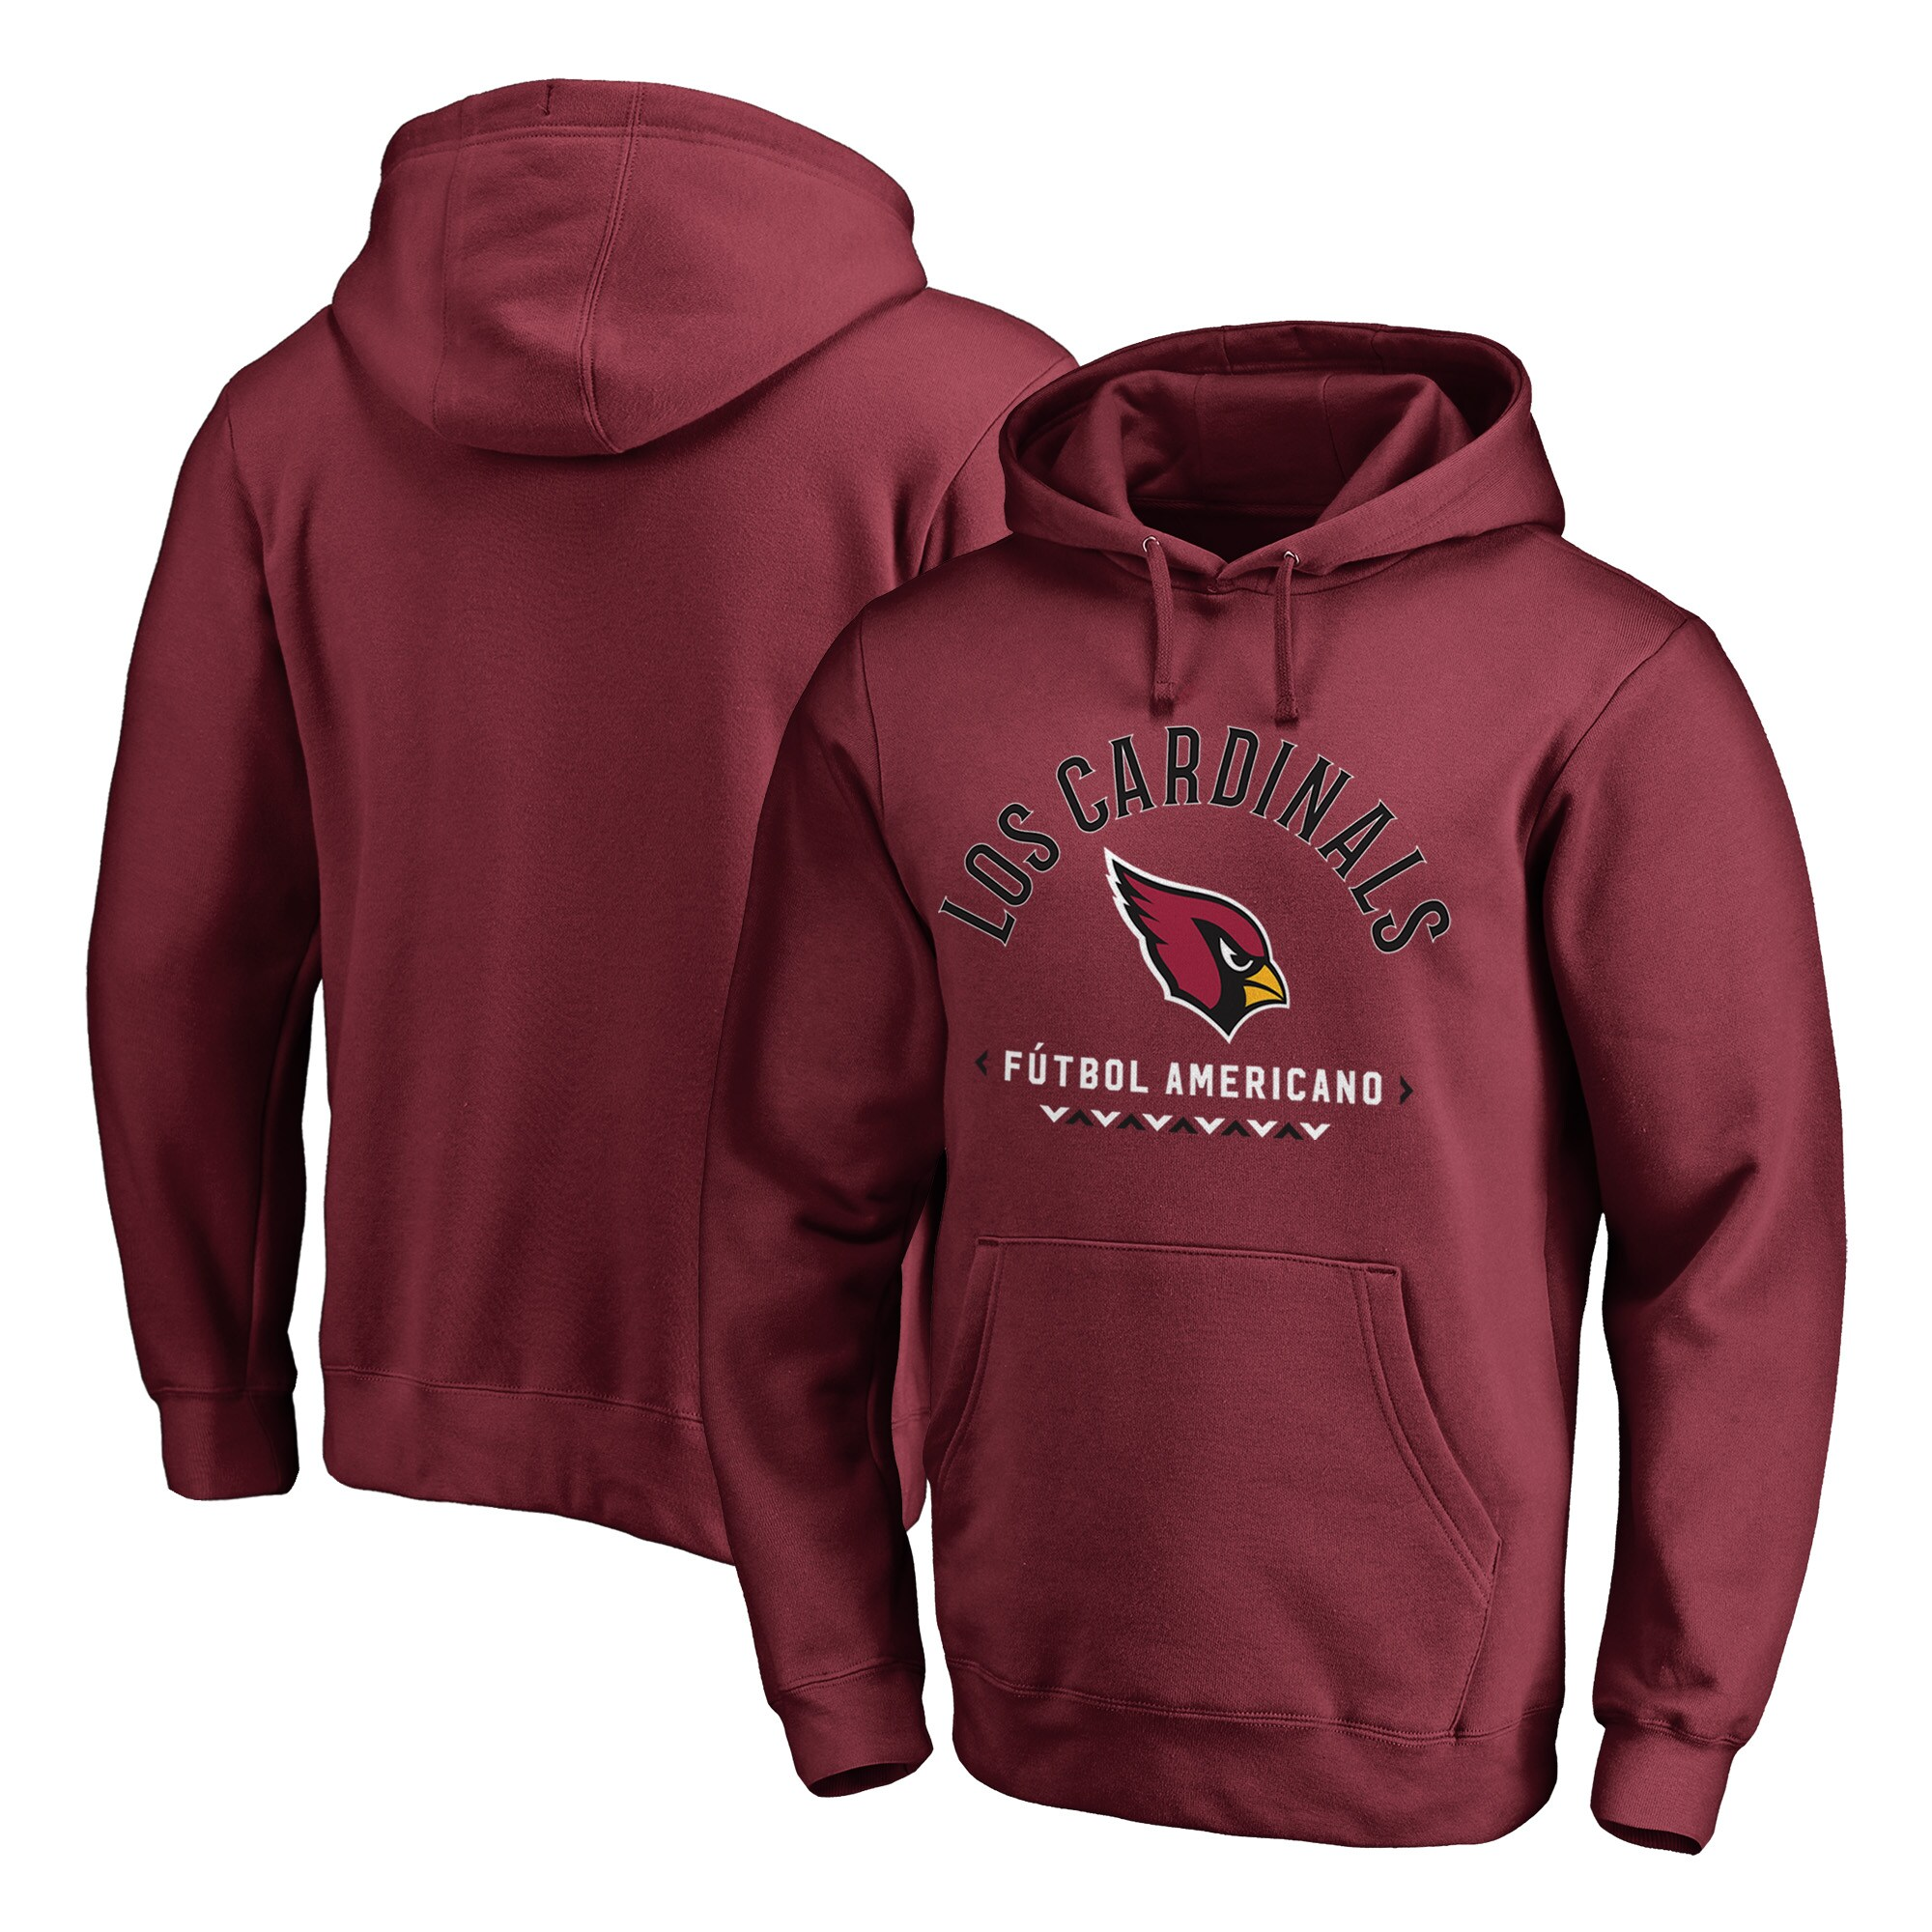 Arizona Cardinals NFL Pro Line by Fanatics Branded Futbol Americano Pullover Hoodie - Cardinal